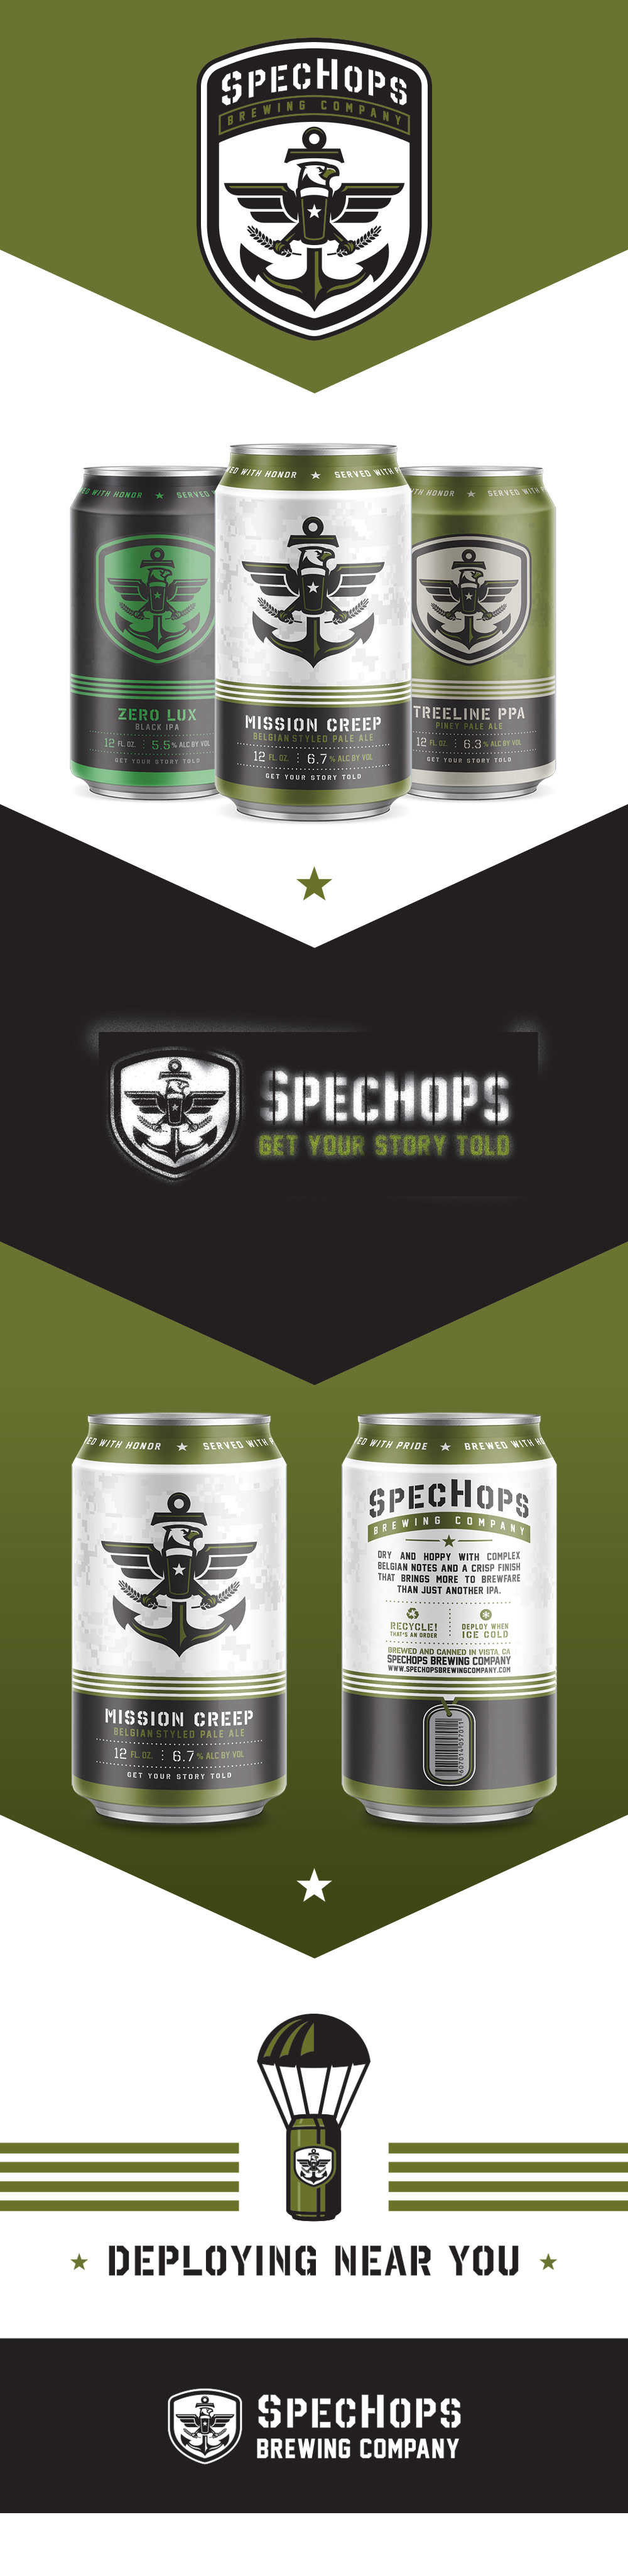 SpecHopsPage.jpg